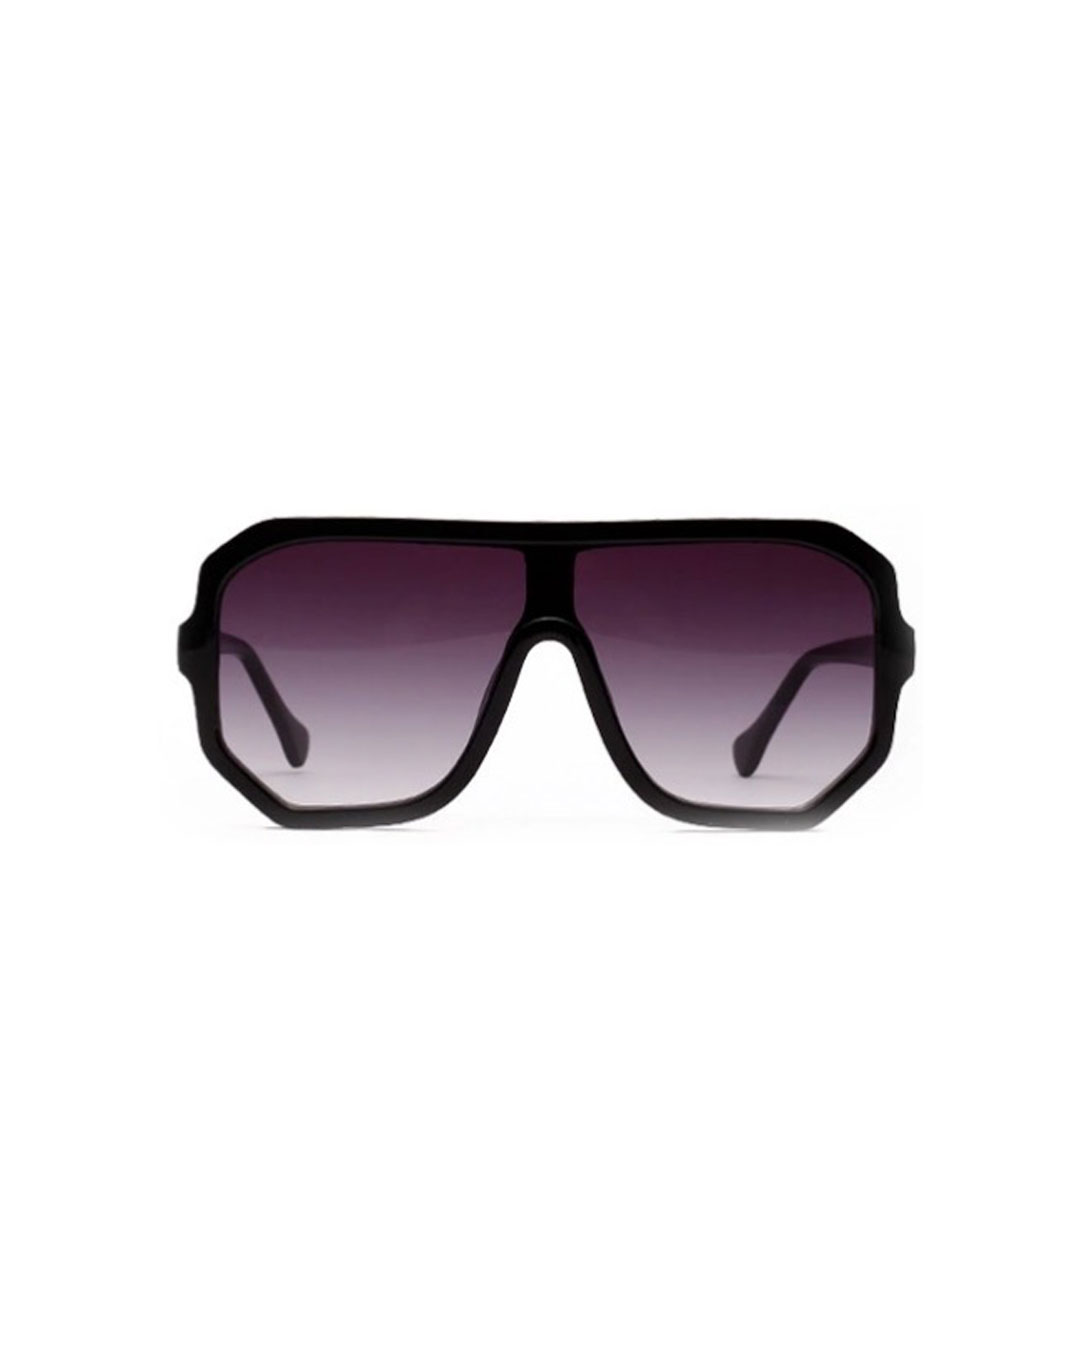 Zara-Shades-Black-2